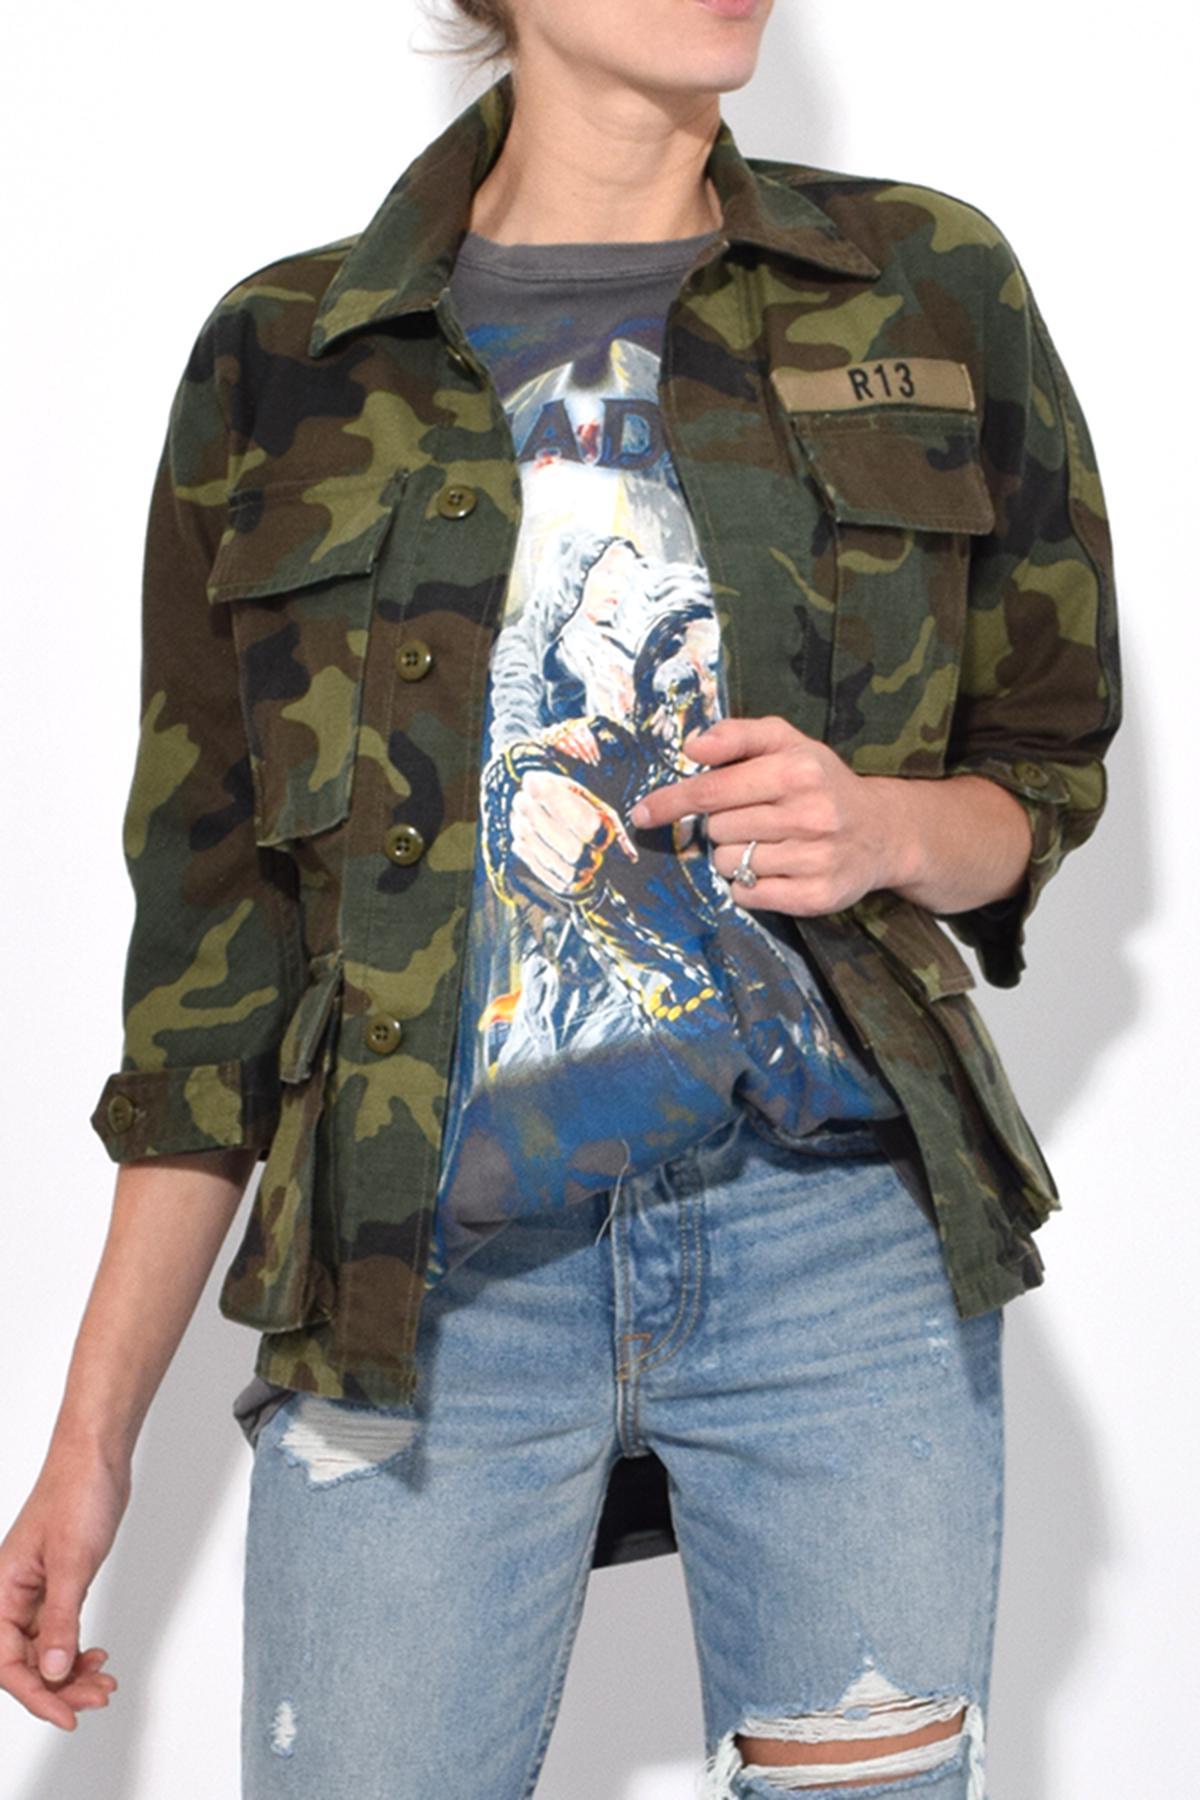 bccb0ac4e8b98 R13 Camo Shrunken Abu Jacket In Camo in Green for Men - Lyst